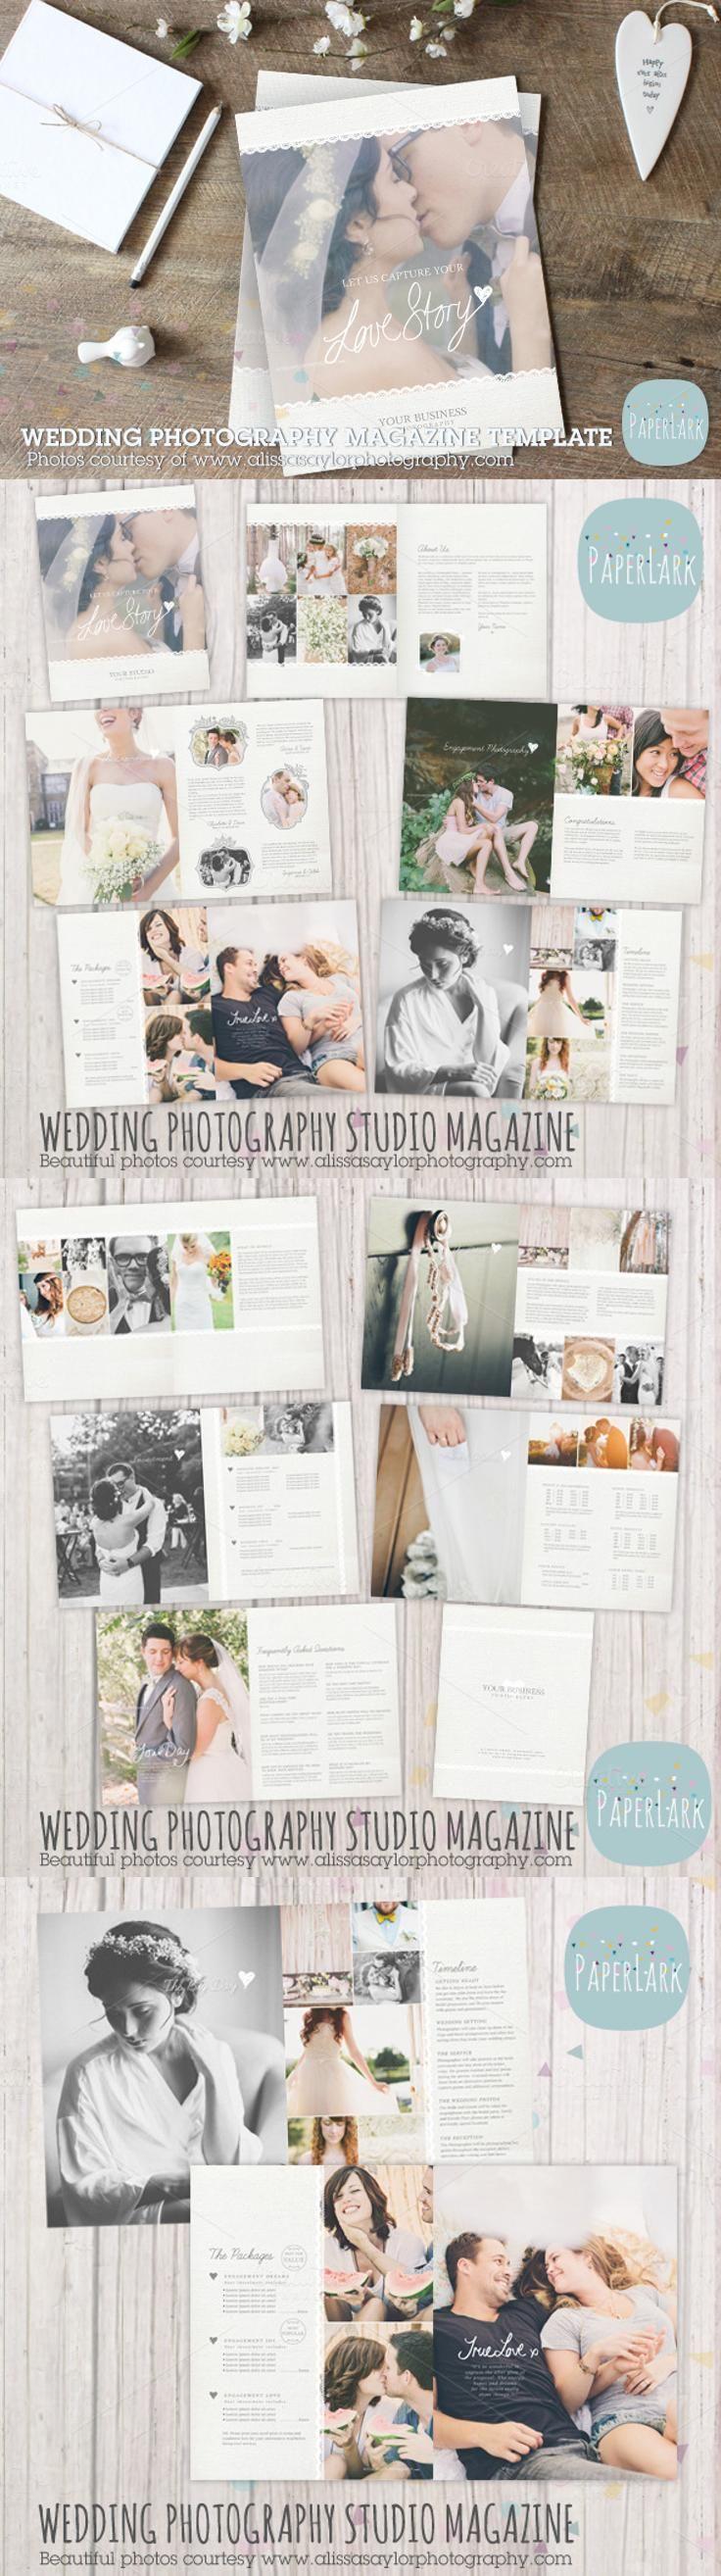 #magazine #design from Paper Lark | DOWNLOAD: https://creativemarket.com/PaperLarkDesigns/552407-PG009-Wedding-Photography-Magazine?u=zsoltczigler